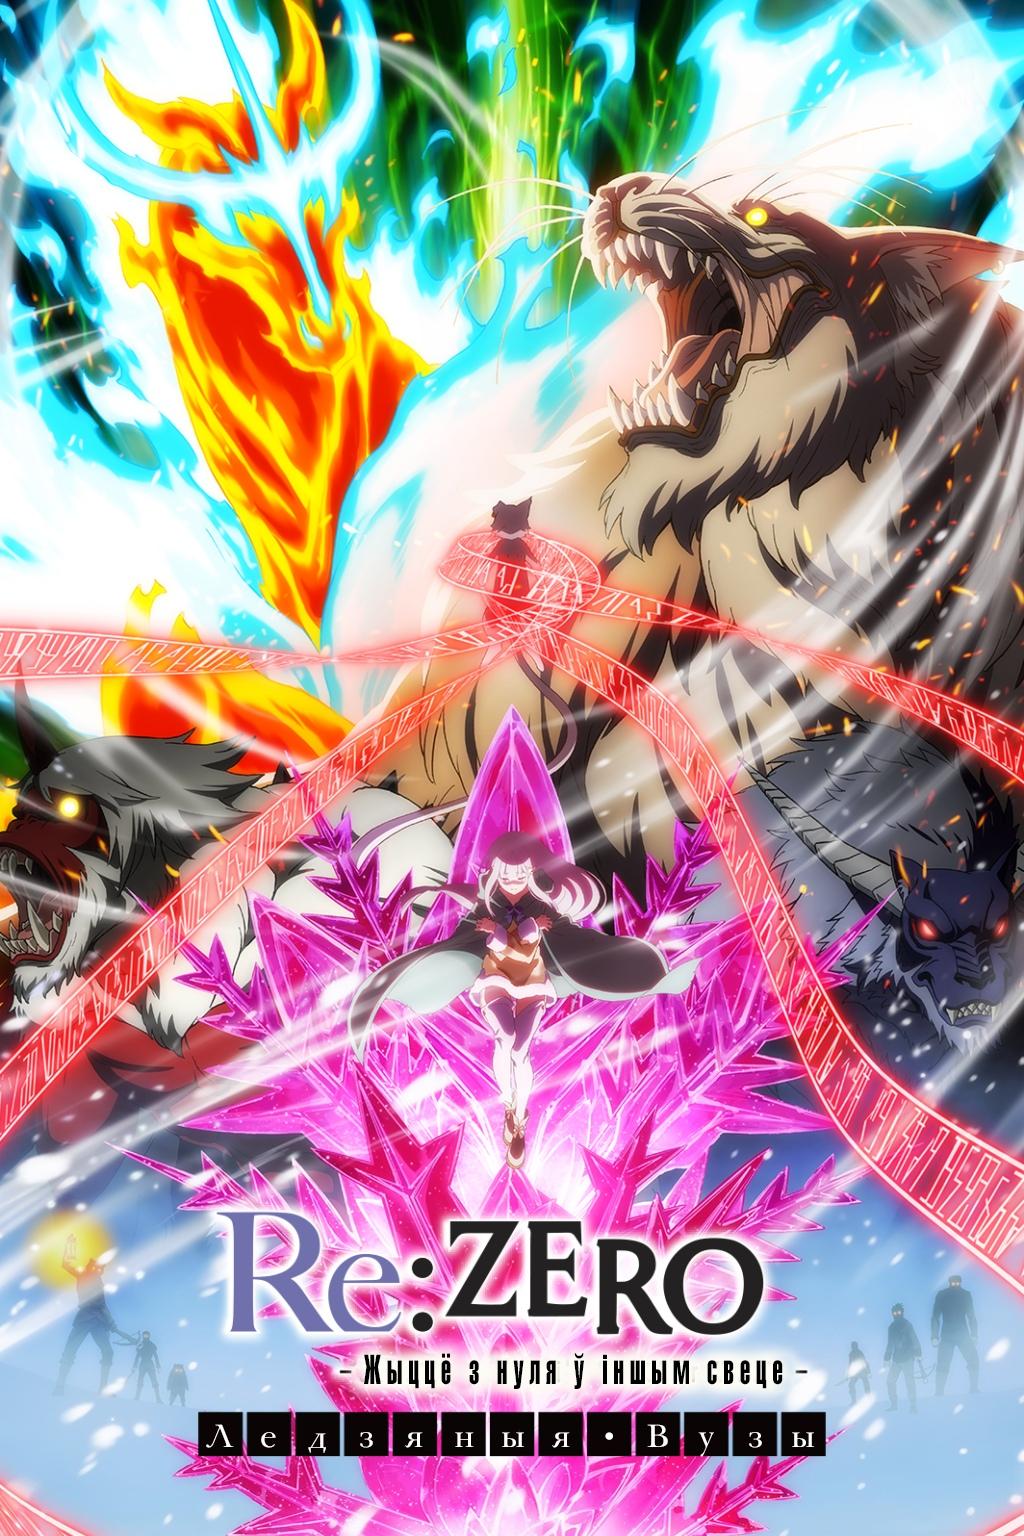 Re:Zero kara Hajimeru Isekai Seikatsu – Hyouketsu no Kizuna, Re:Zero. Жыццё з нуля ў іншым свеце: Ледзяныя вузы, re:zero-kara-hajimeru-isekai-seikatsu-hyouketsu-no-kizuna